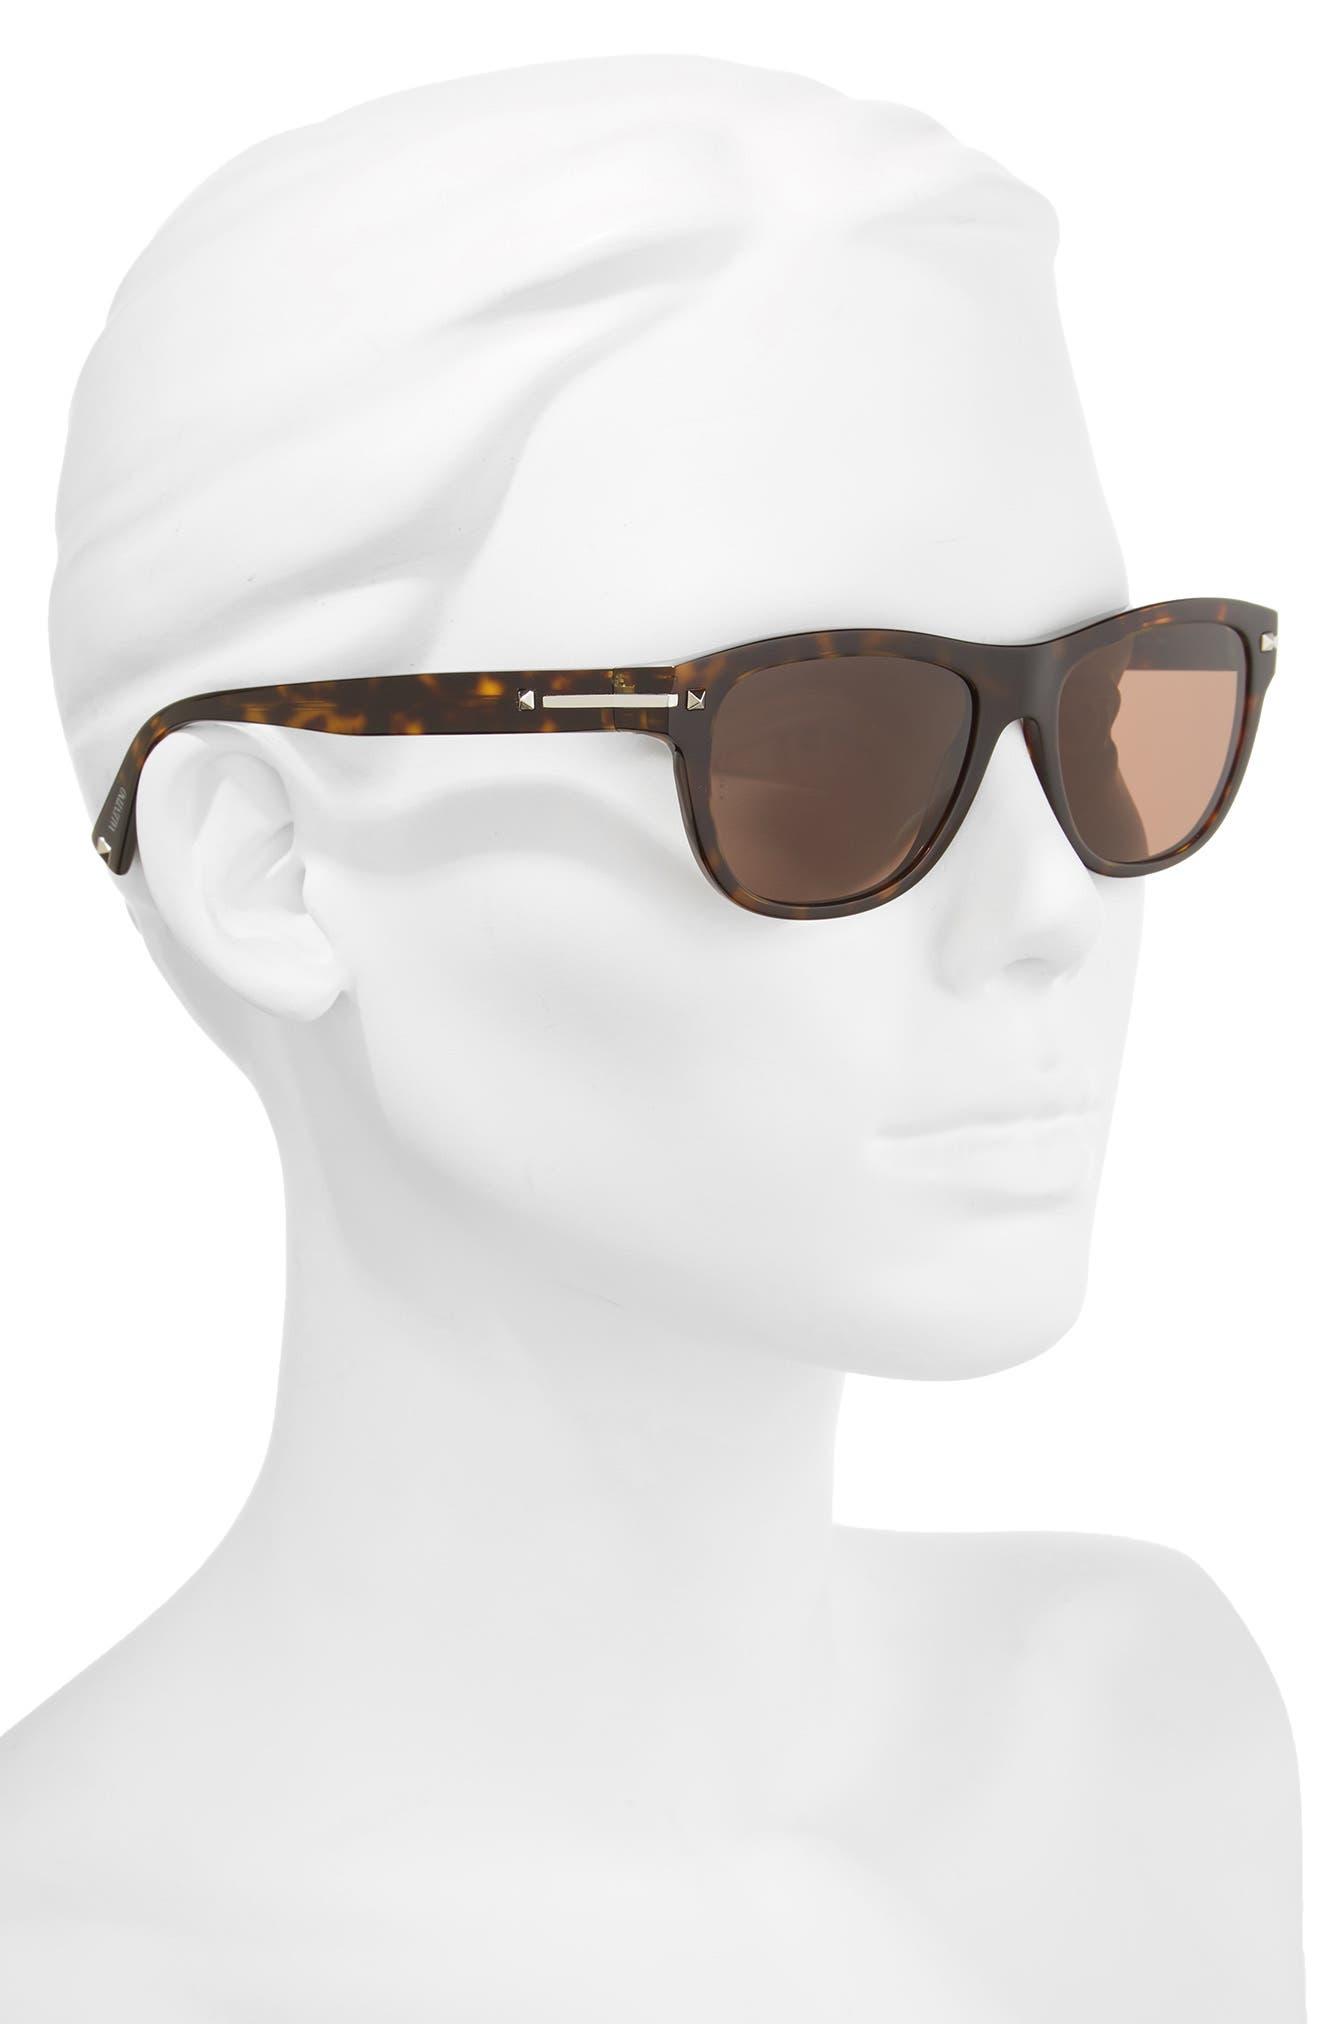 53mm Sunglasses,                             Alternate thumbnail 2, color,                             BROWN/ HAVANA